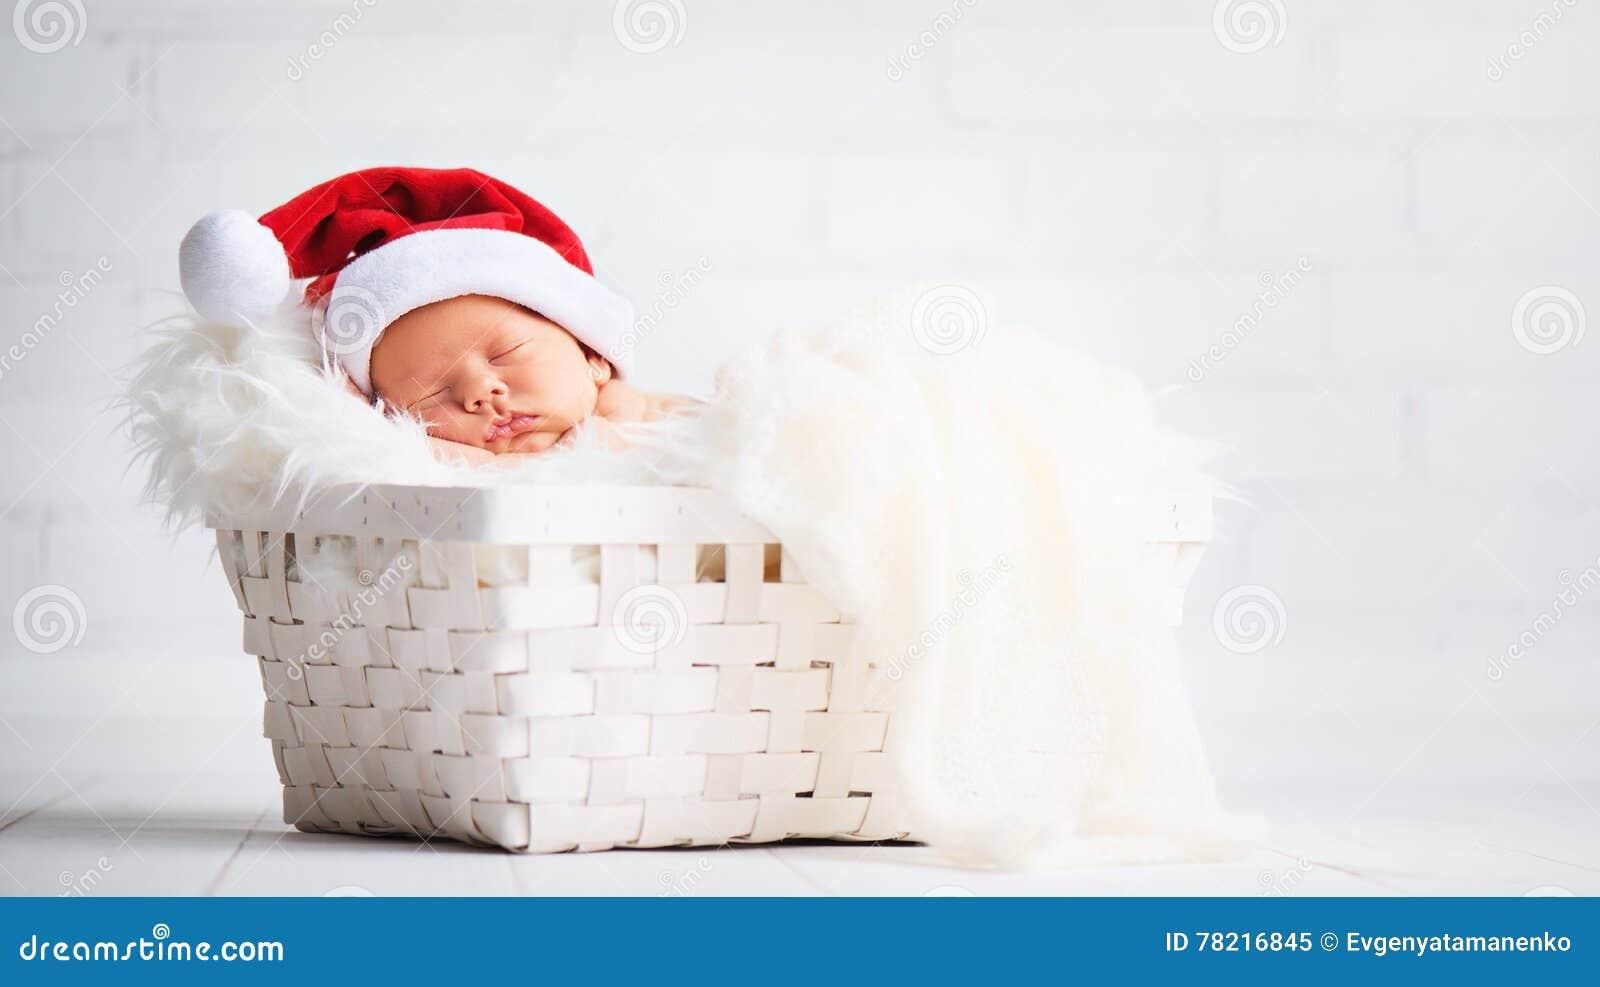 Sleeper newborn baby in Christmas Santa cap